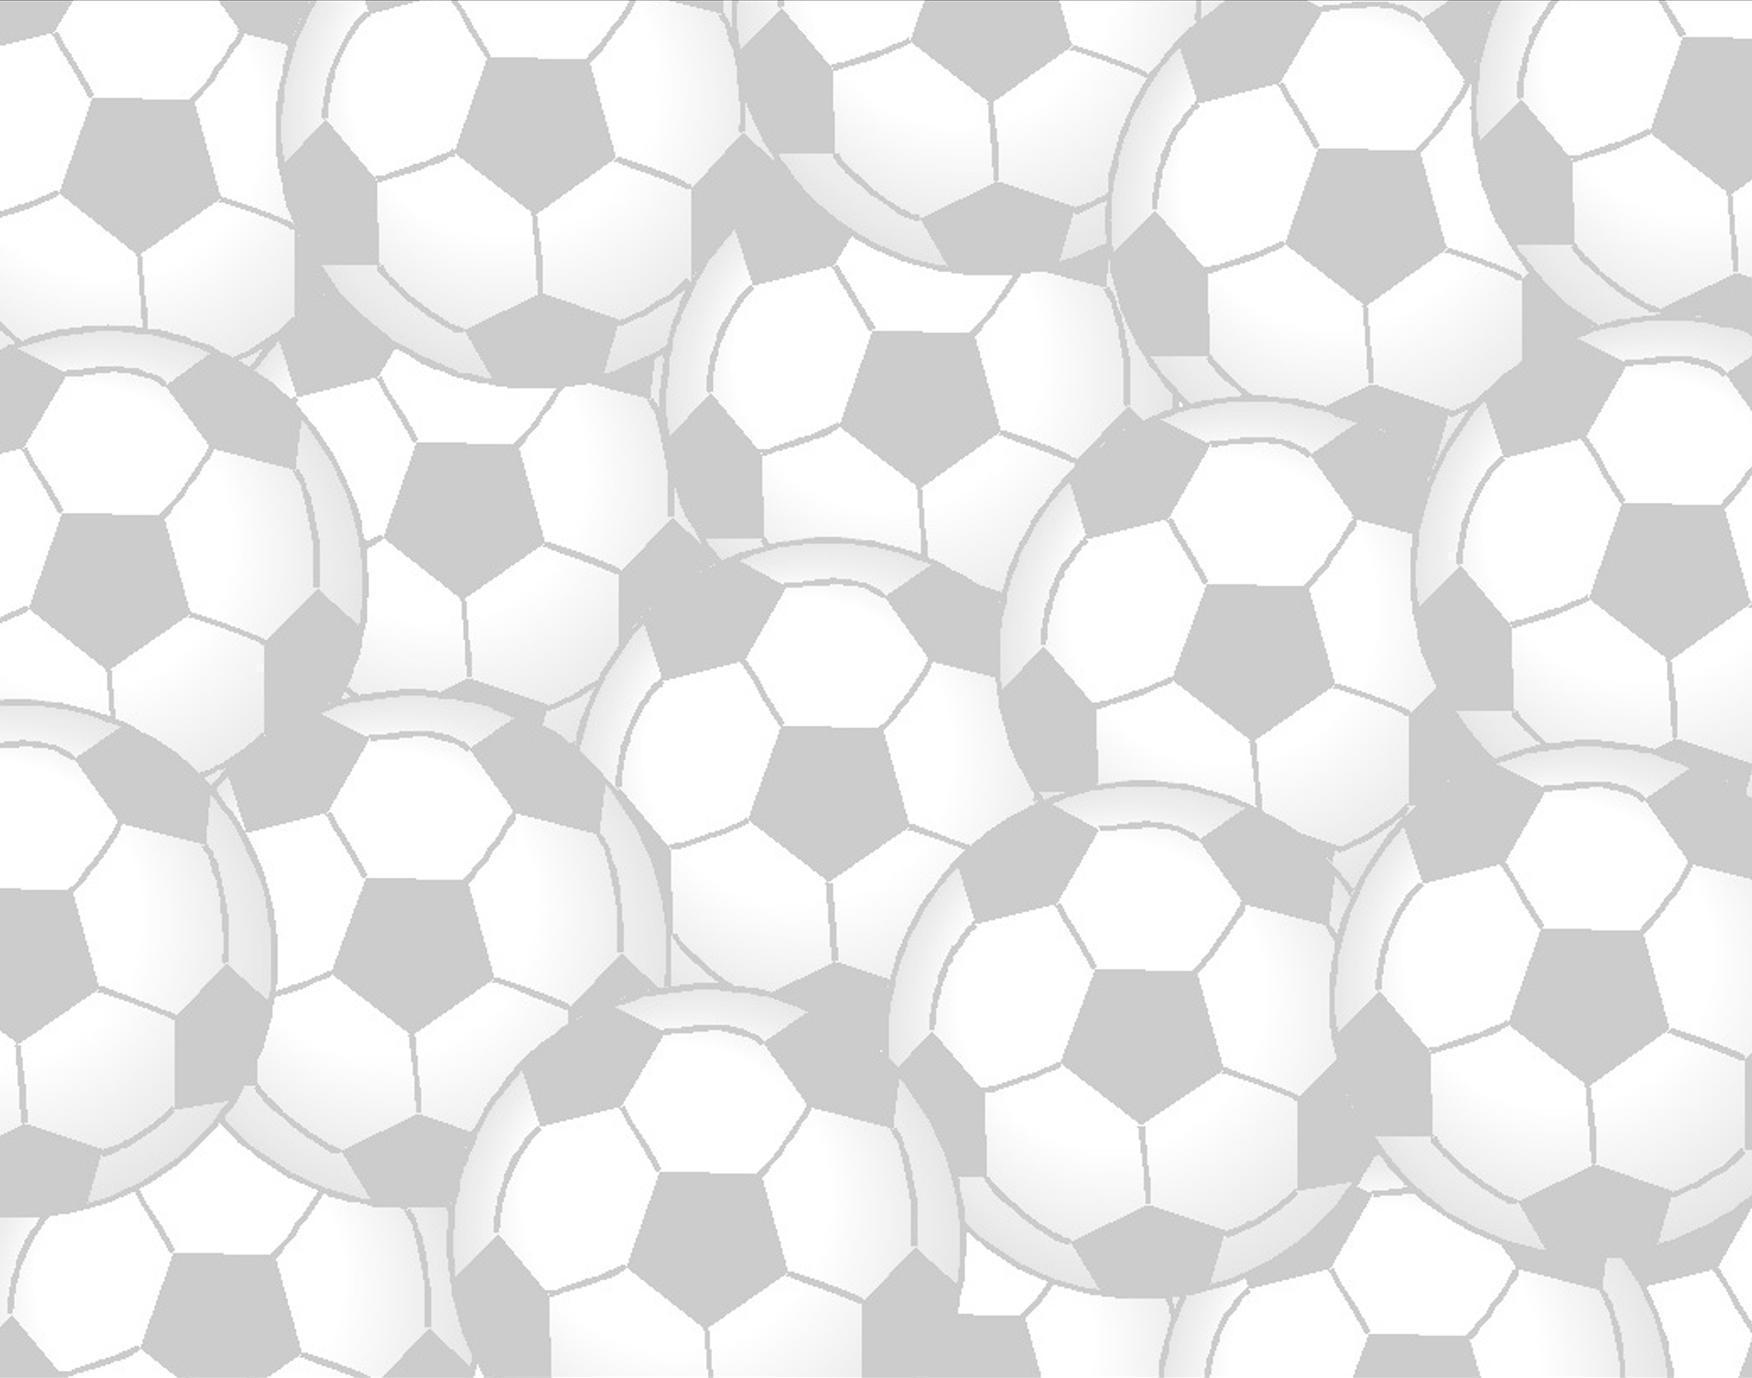 Soccer Ball Wallpapers: Soccer Backgrounds